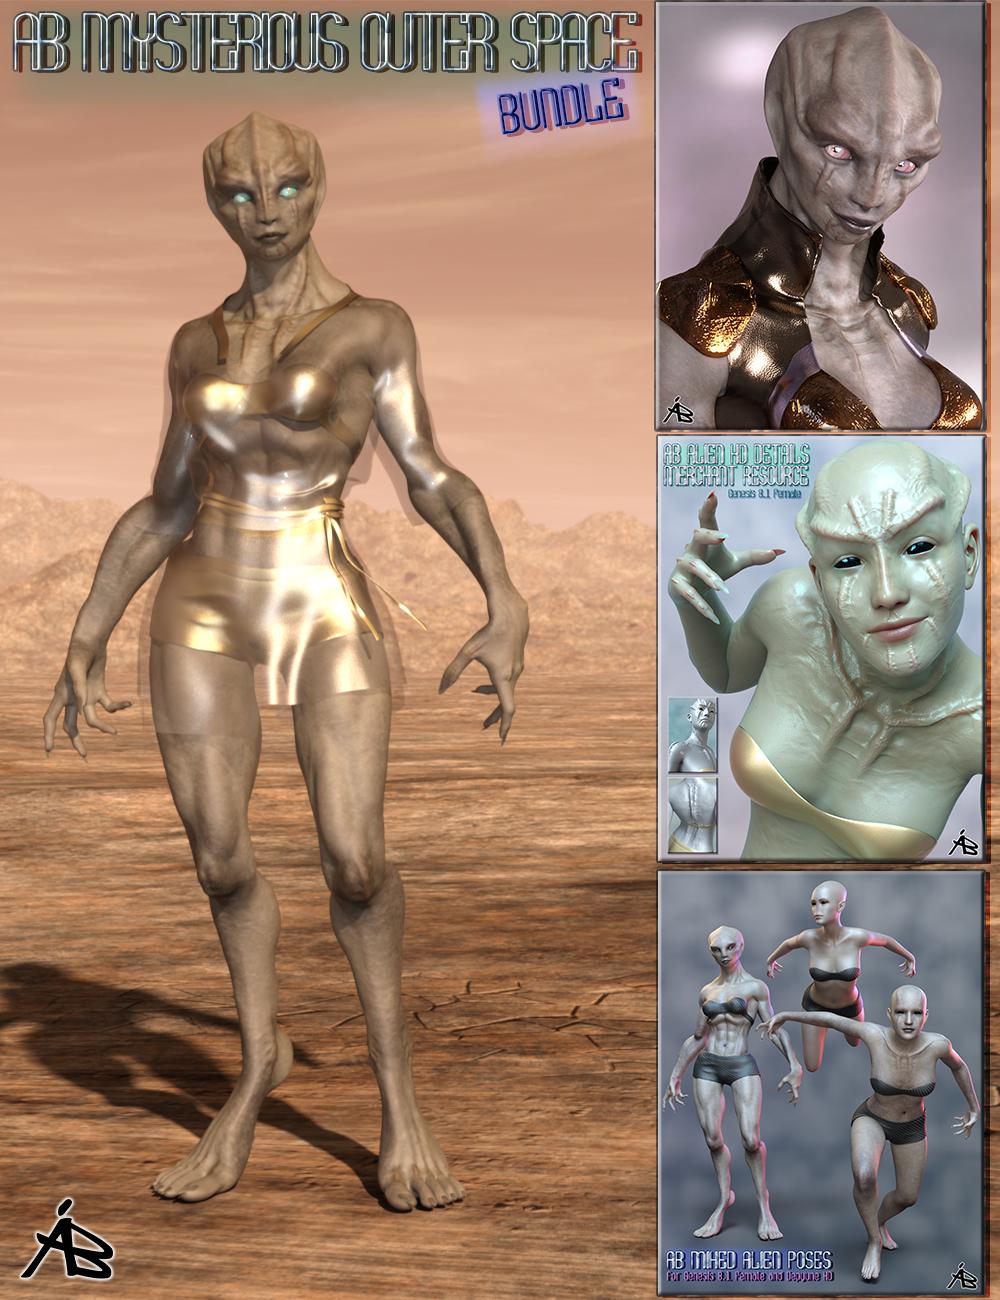 AB Mysterious Outer Space Bundle by: AuraBianca, 3D Models by Daz 3D